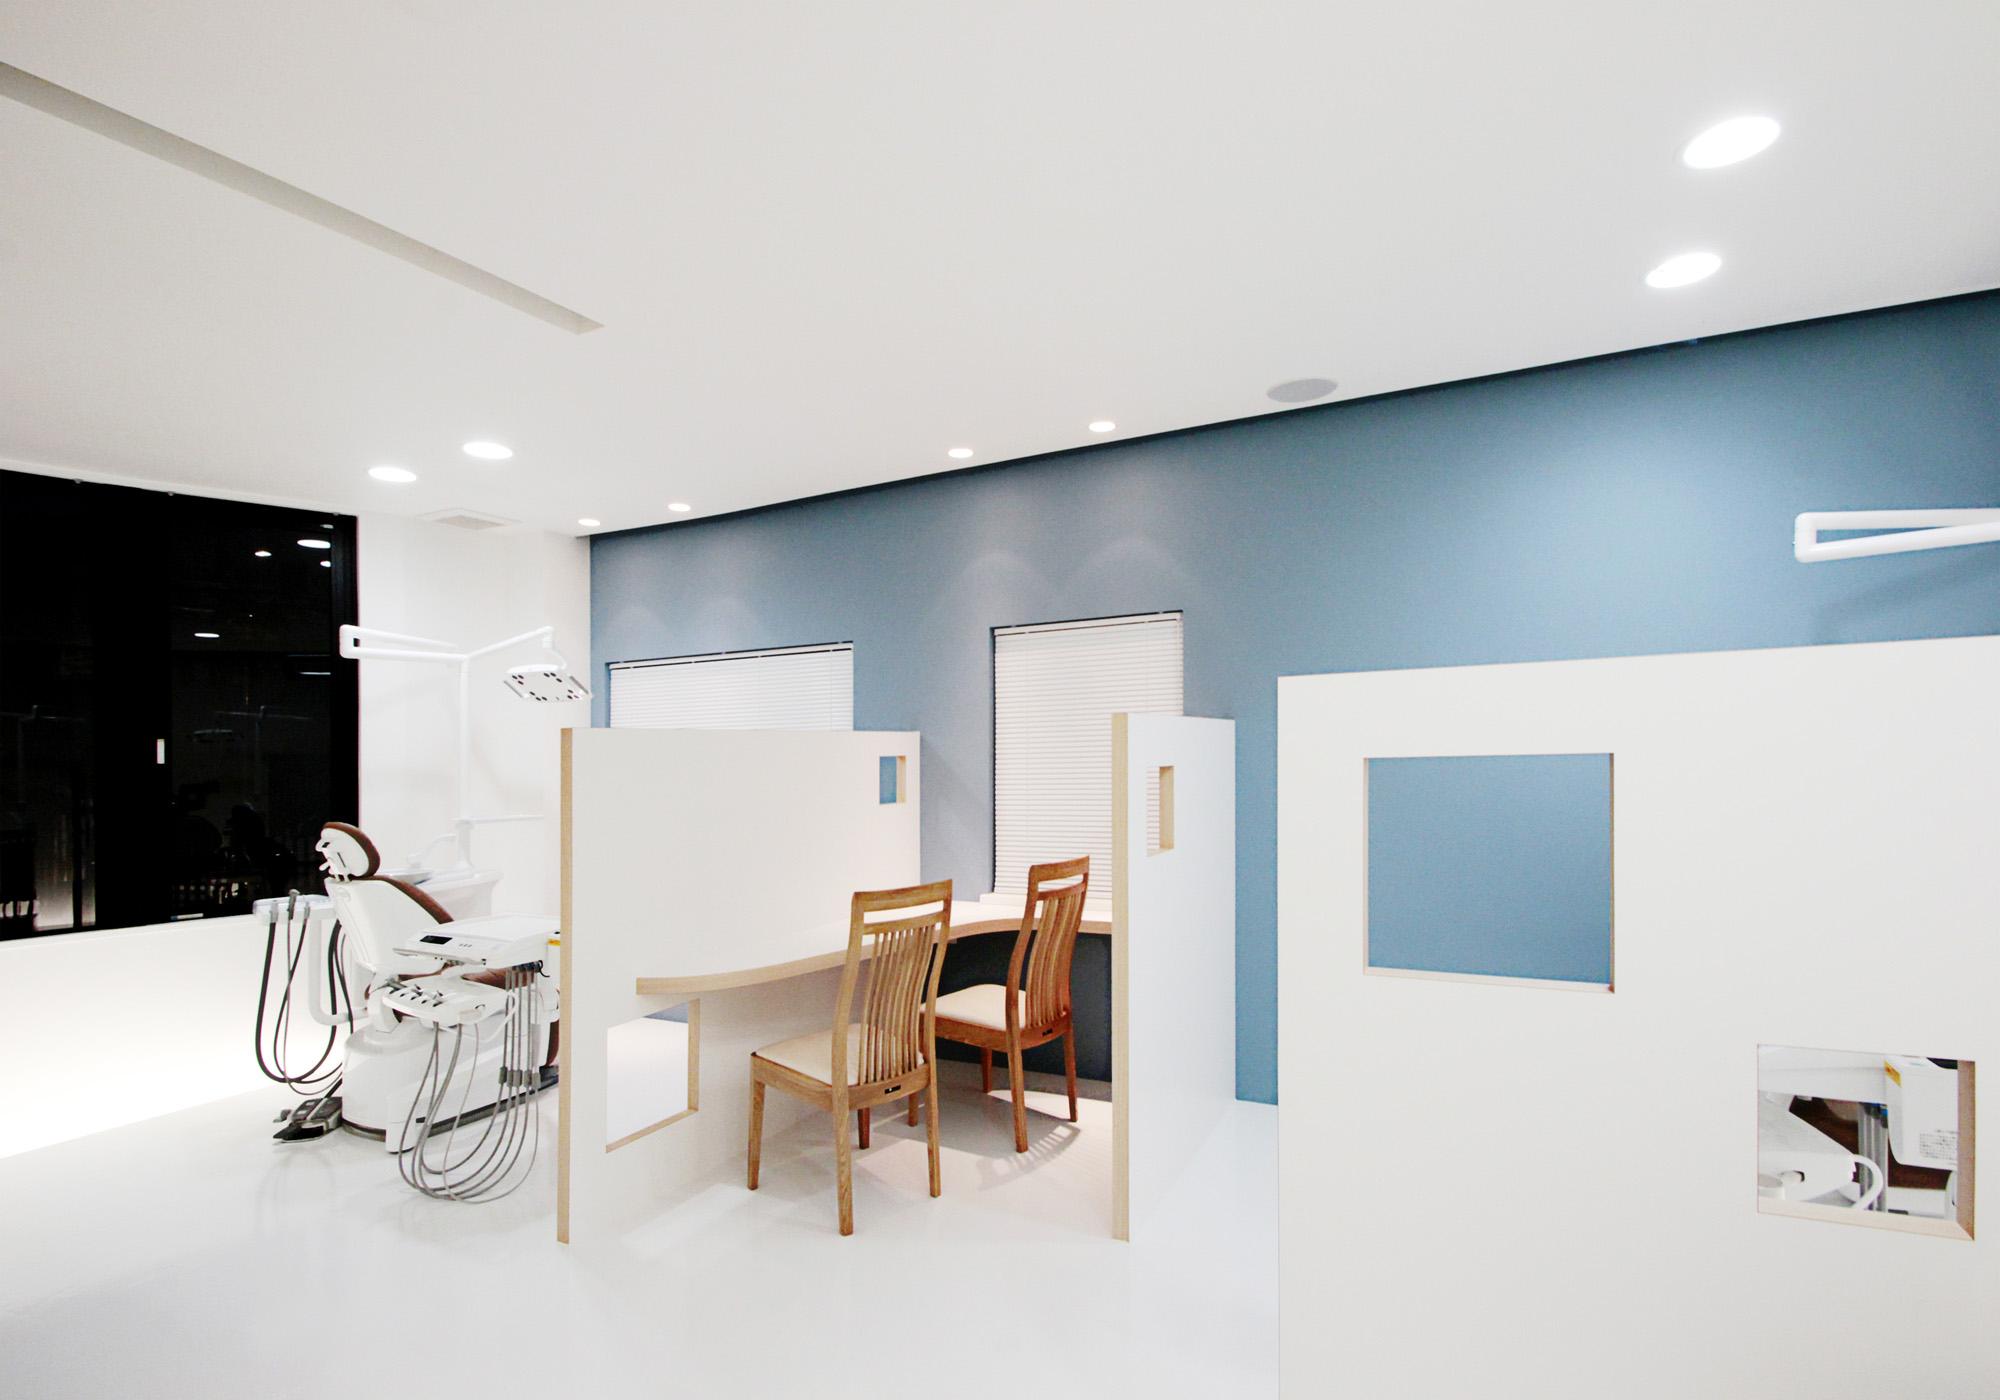 07 - t-d-clinic-t-lex-brain-design-office_mooponto